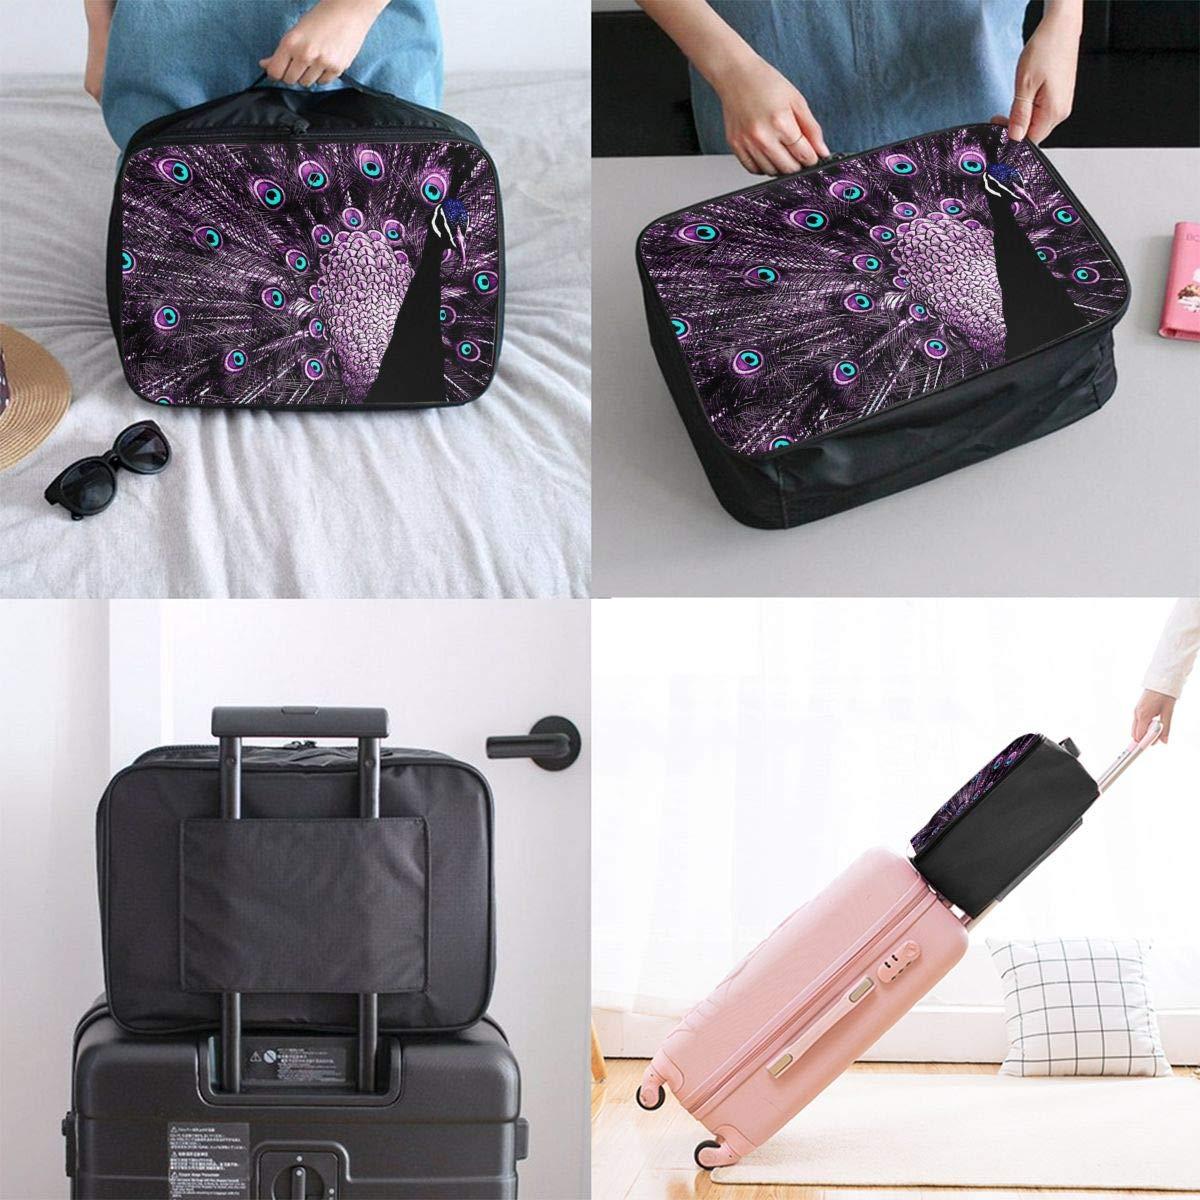 Travel Luggage Duffle Bag Lightweight Portable Handbag Peacock Pattern Large Capacity Waterproof Foldable Storage Tote